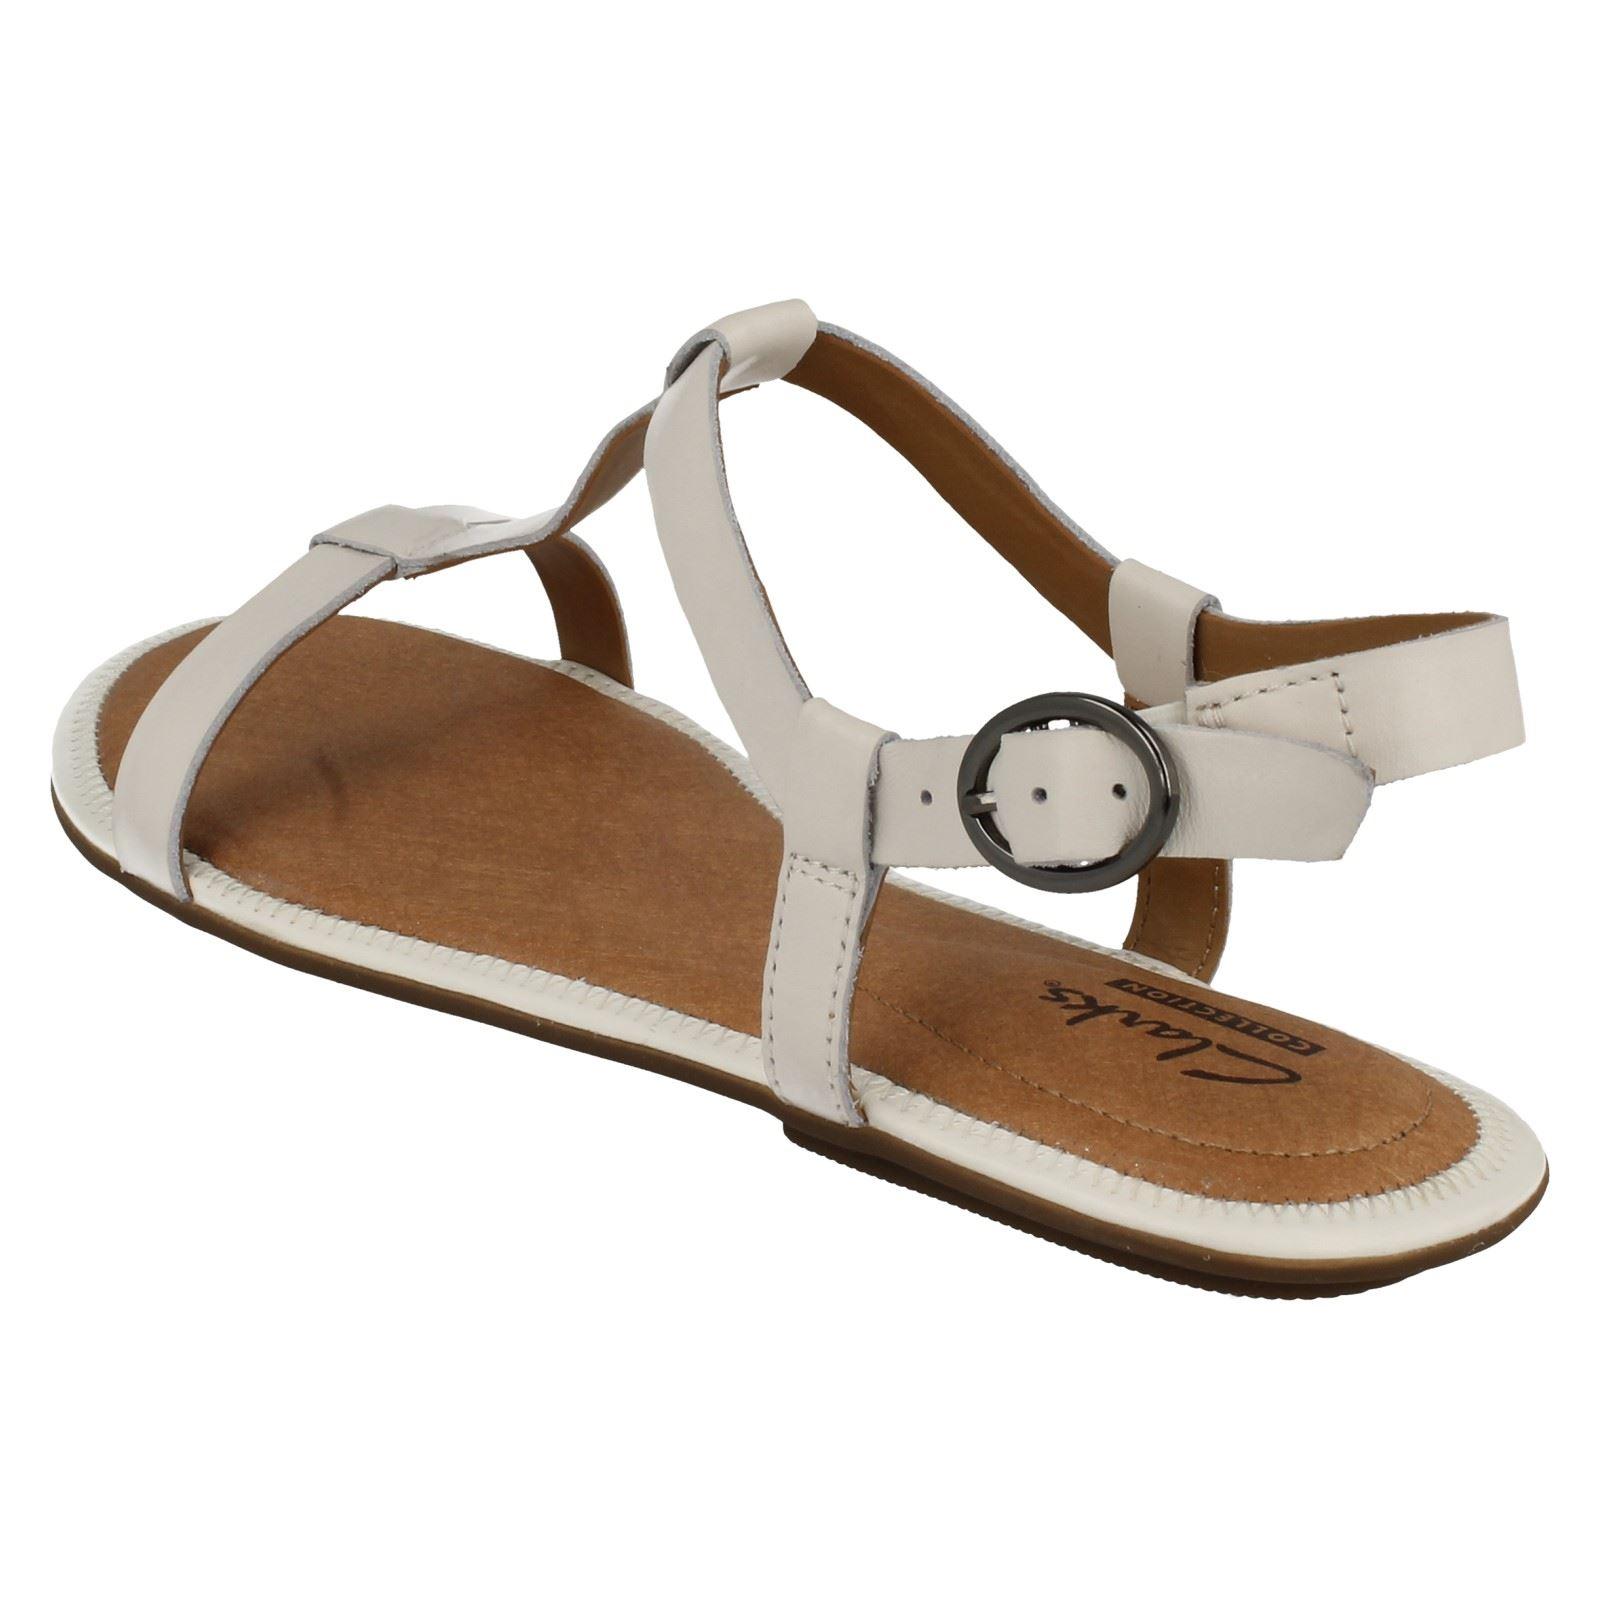 3e86dd85588a99 Ladies-Clarks-Risi-Hop-Strap-Sandals thumbnail 15